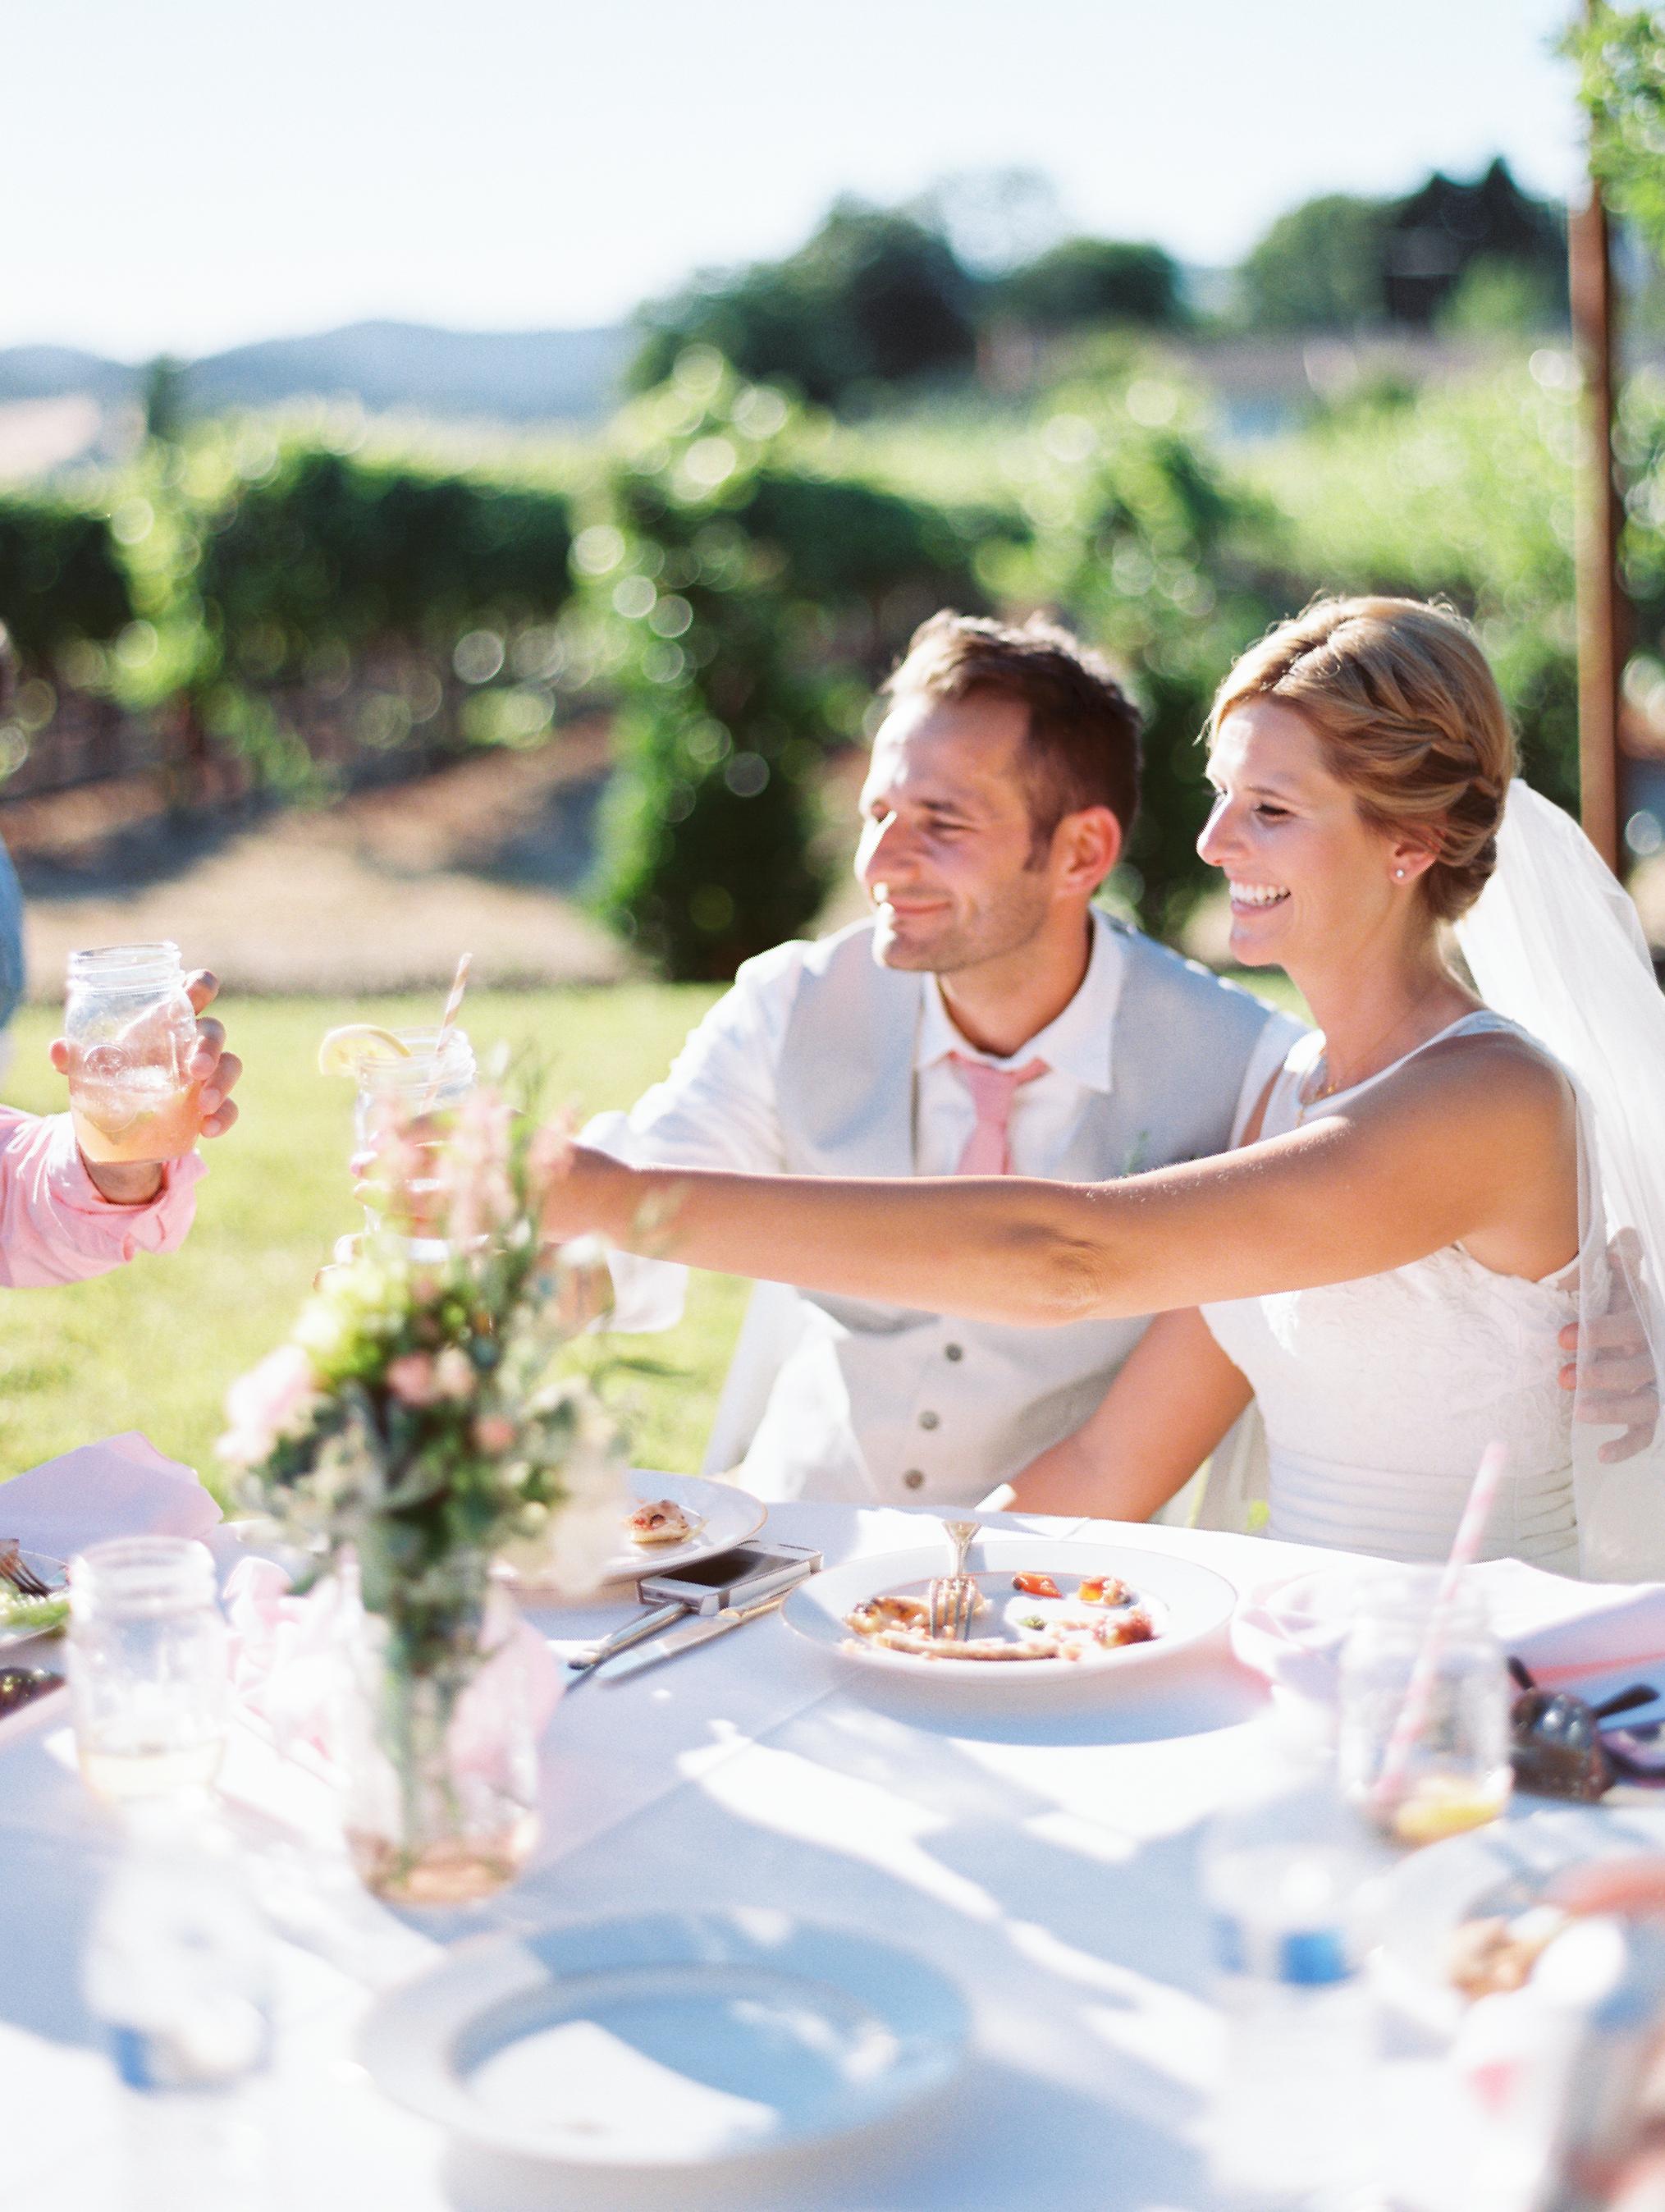 Anders Wedding by Jessica Garmon-274.JPG